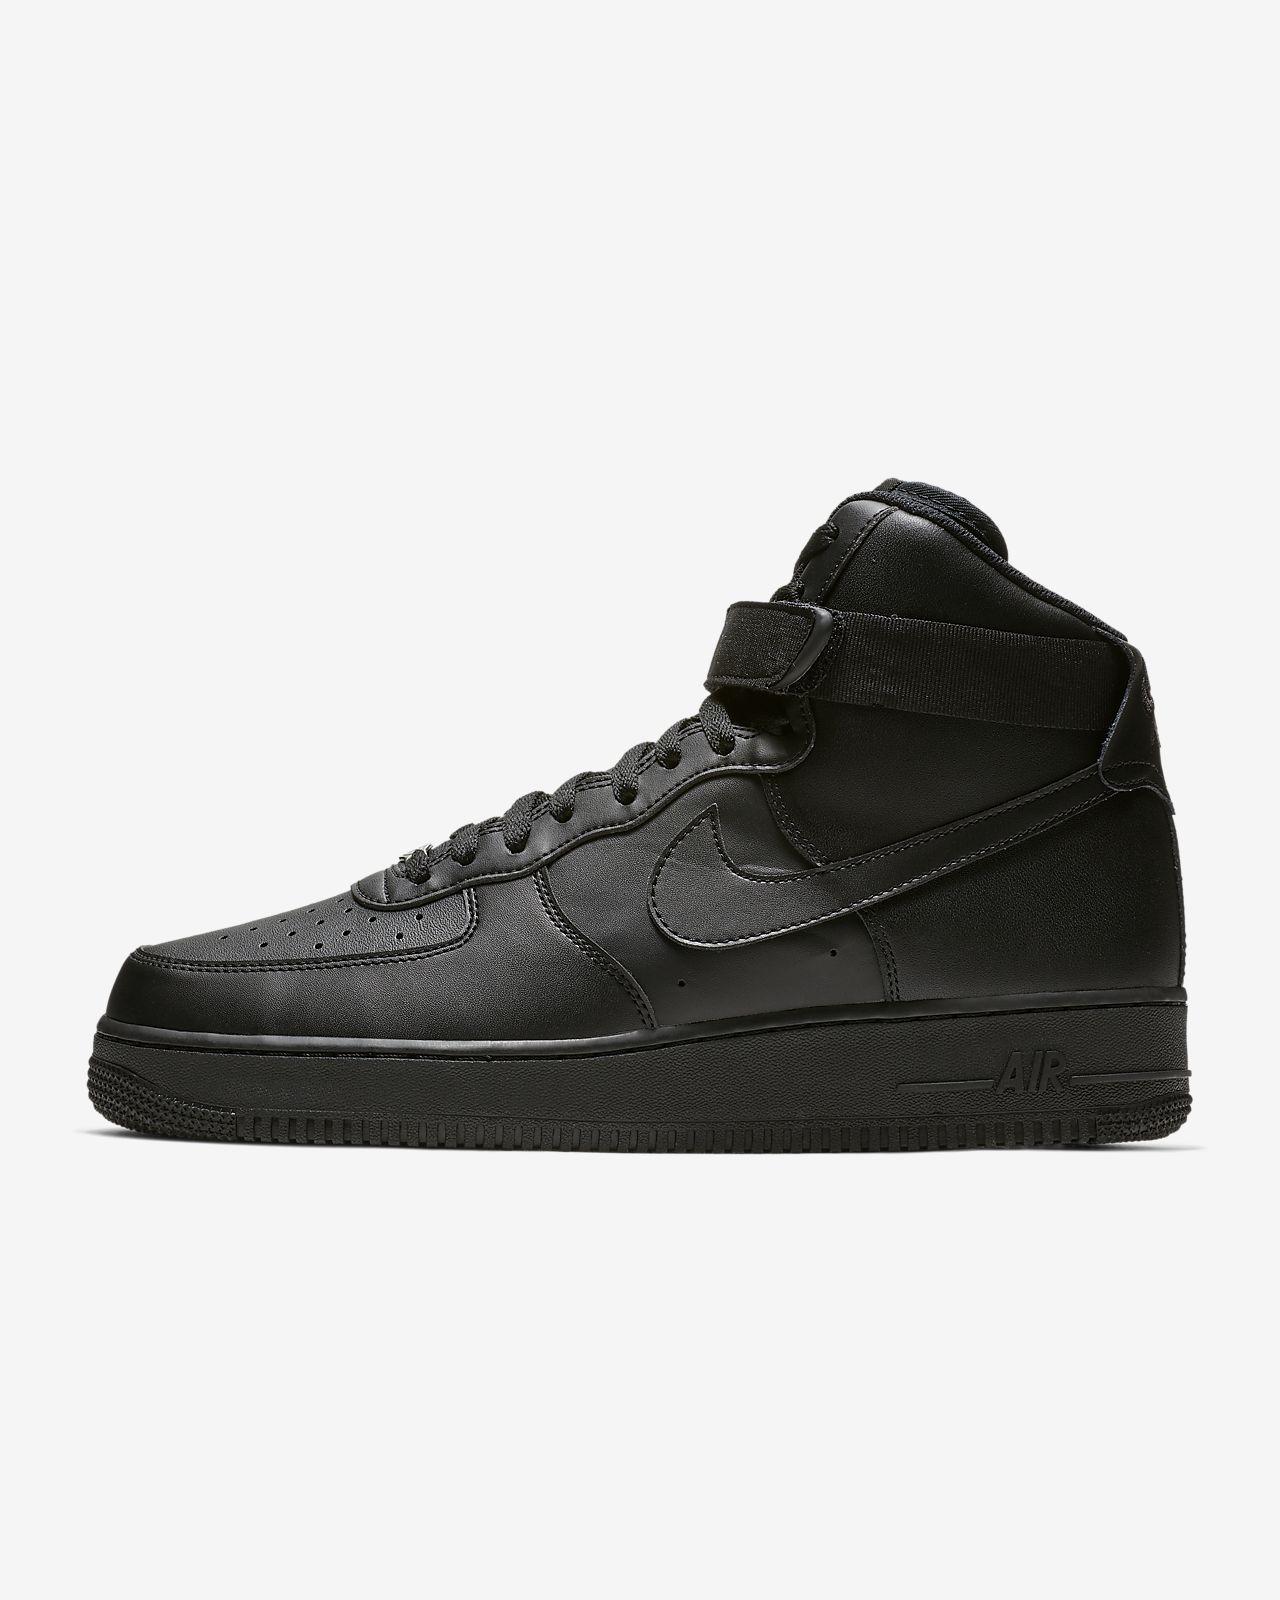 Calzado para hombre Nike Air Force 1 High 07